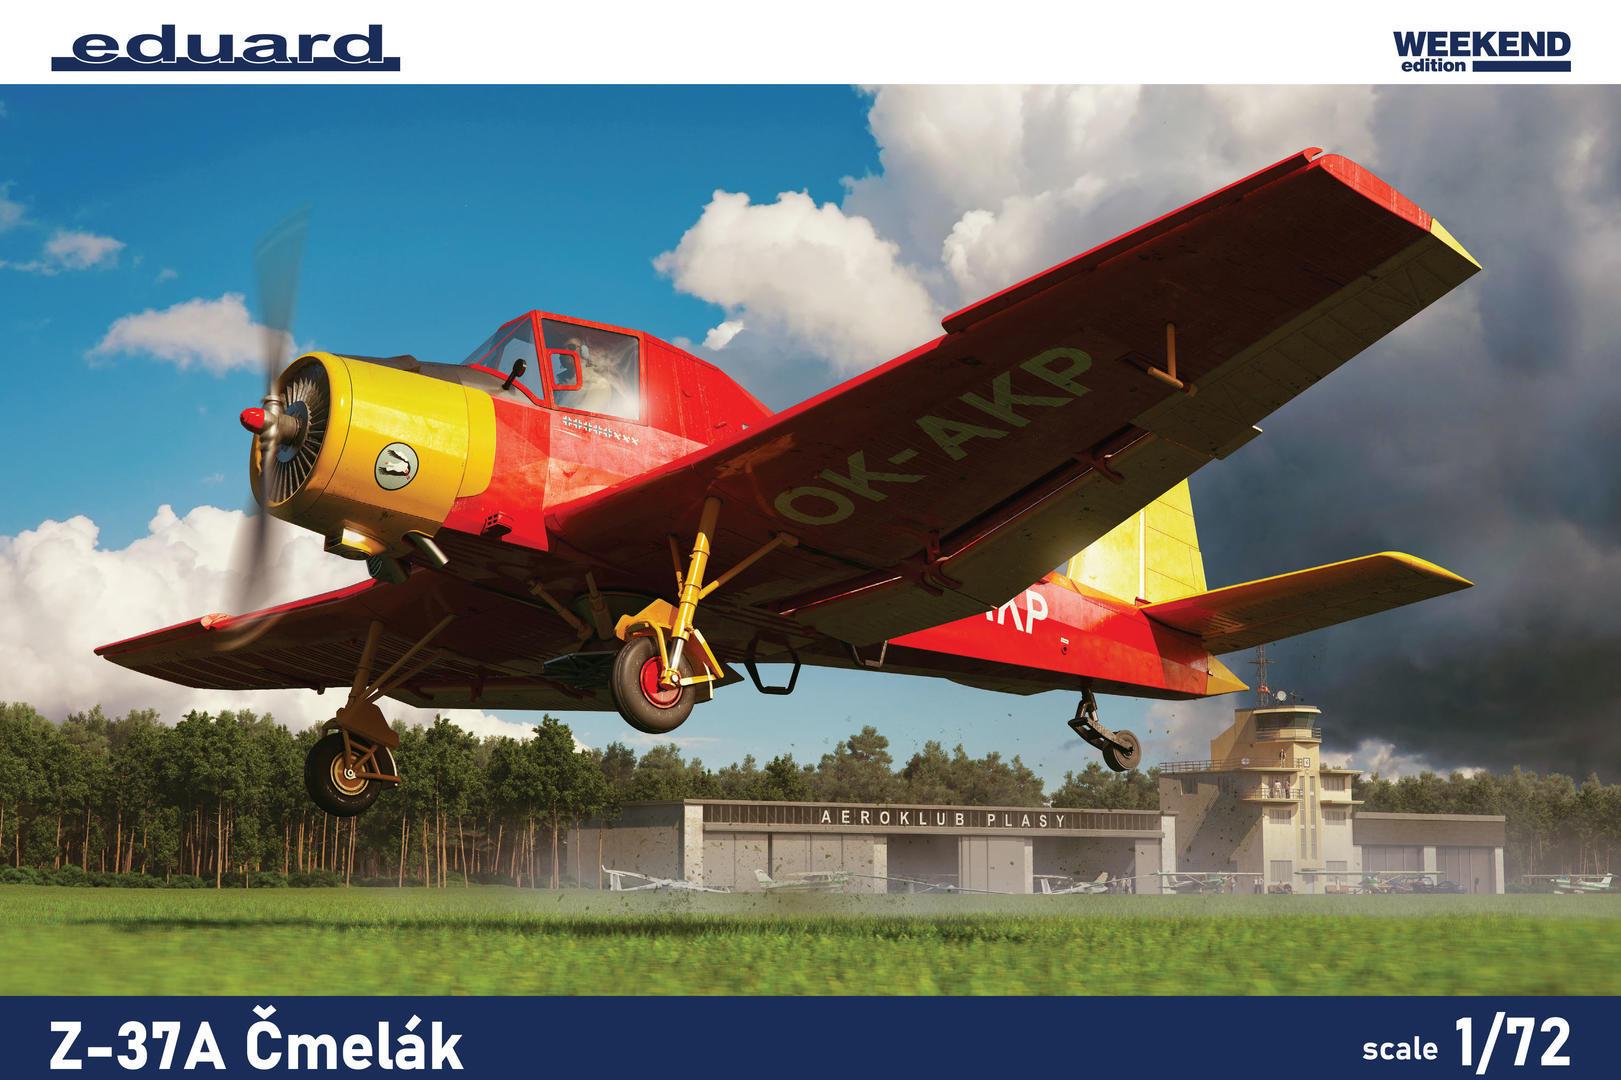 Eduard 1/72 Z-37A Cmelak [Weekend Edition]